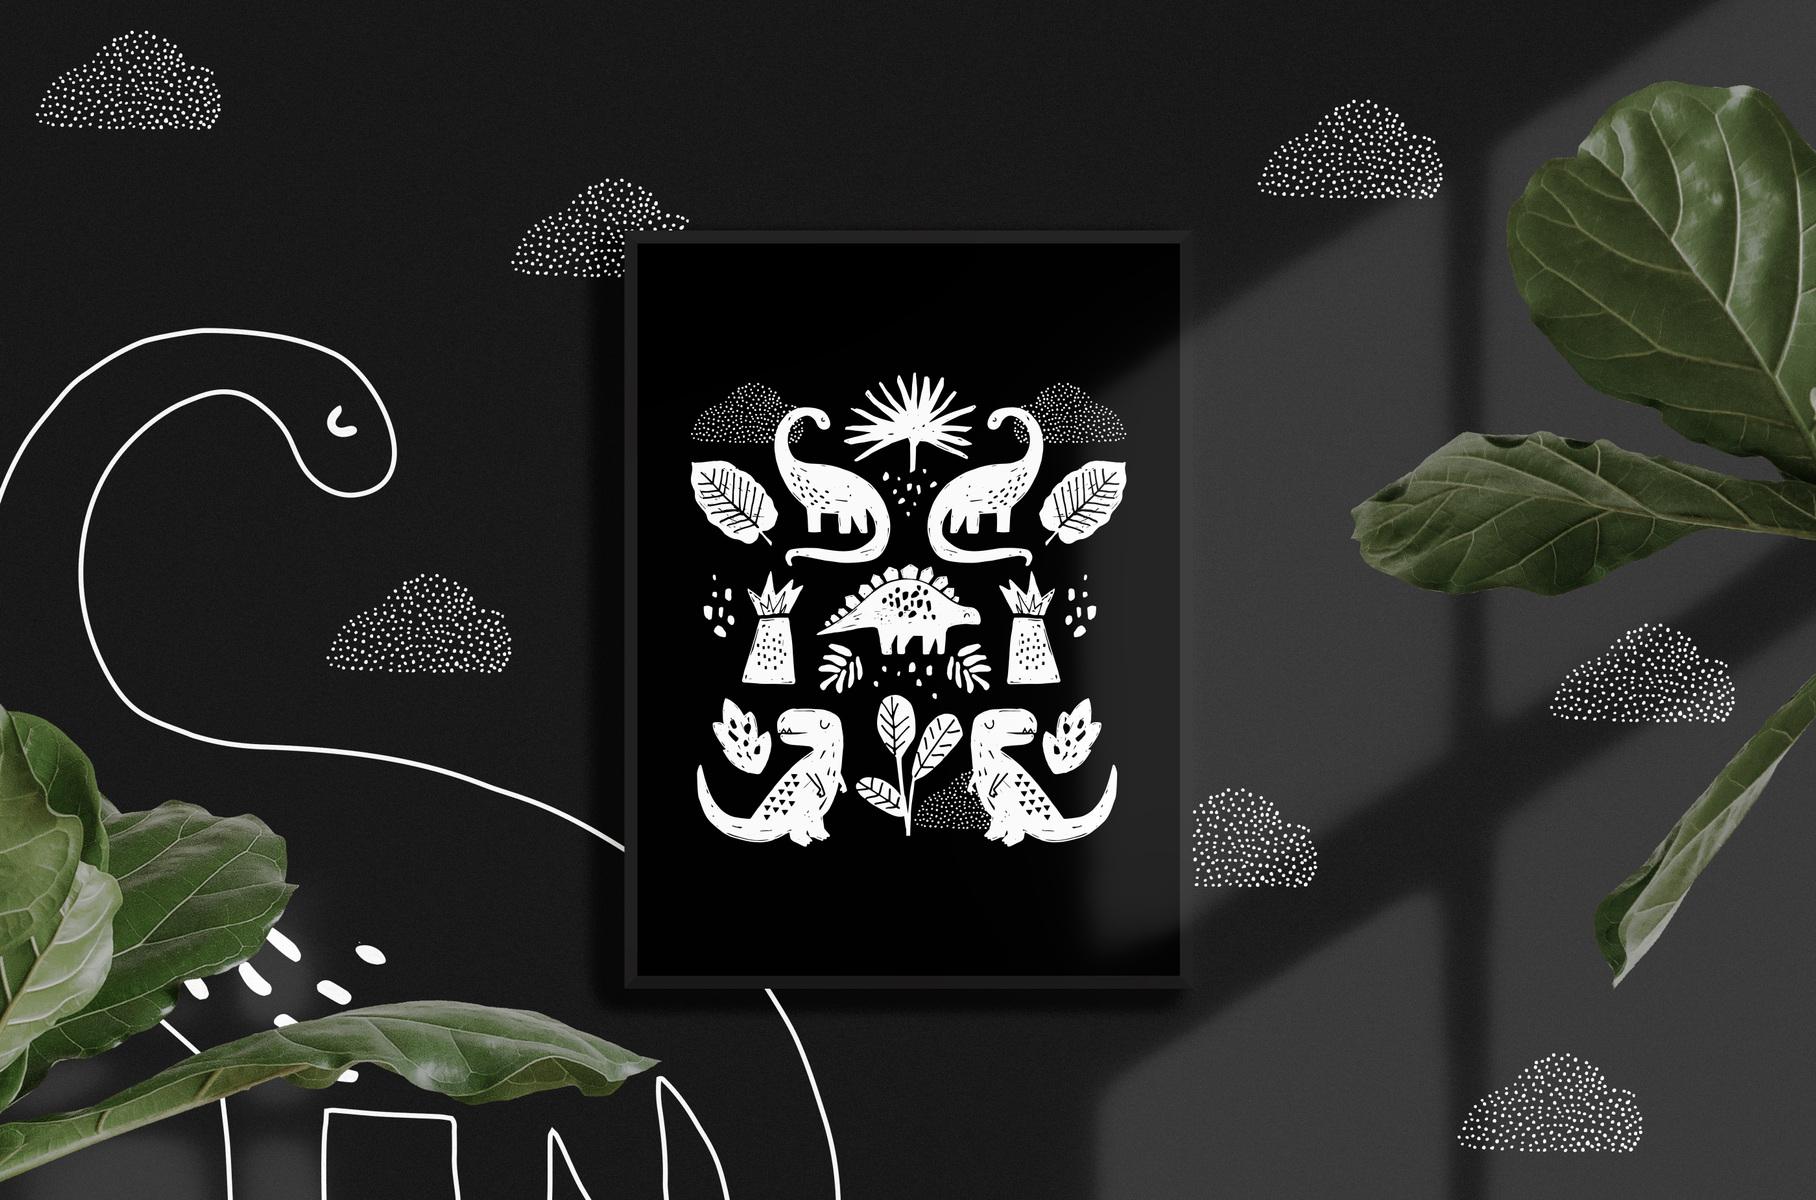 mfa -- designer textile - affiche dino noir et blanc, 12 X 16, 25$